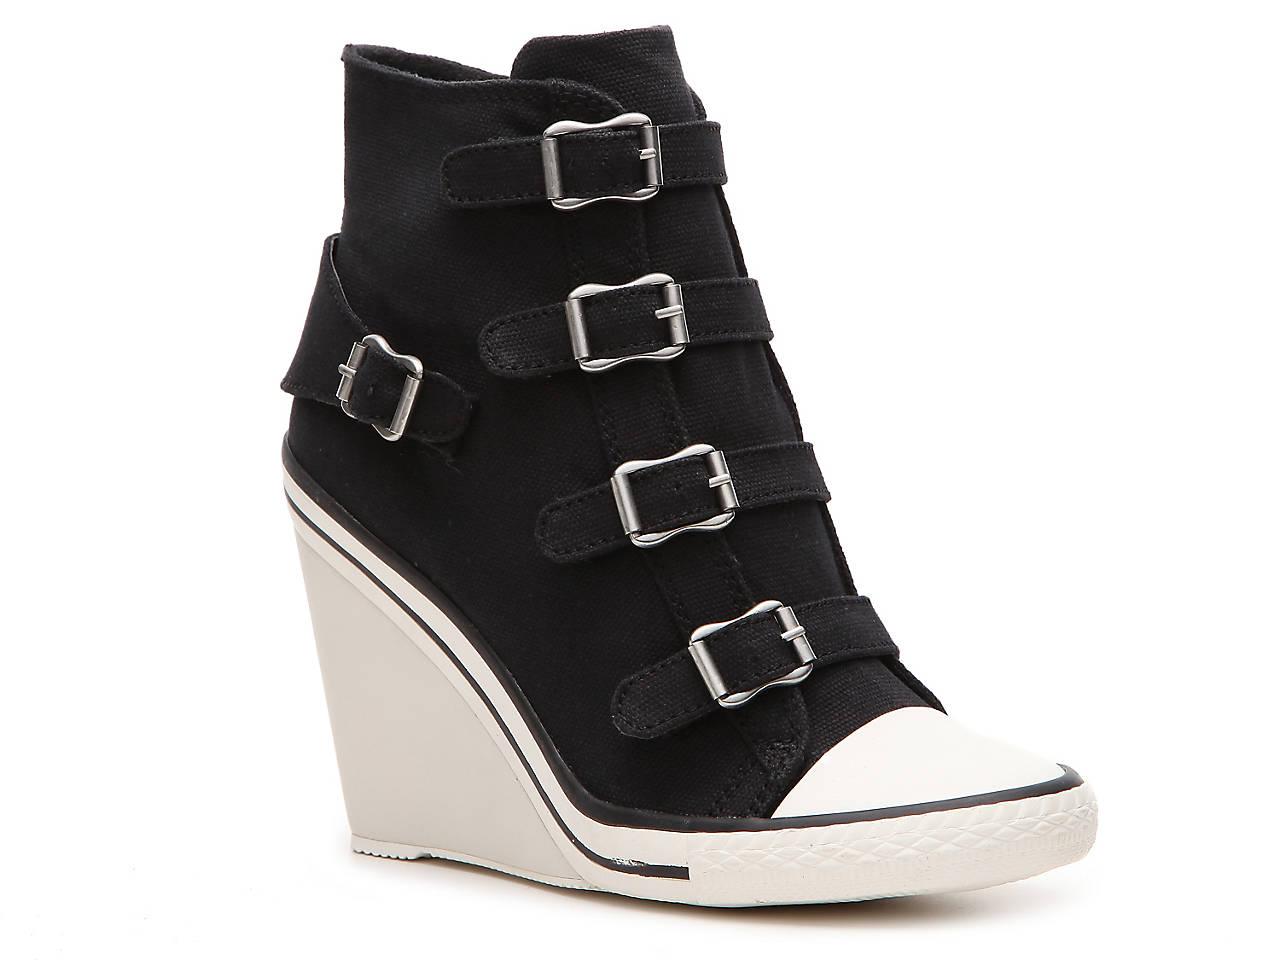 090c4512f683 Rock   Candy Jolt Canvas Wedge Sneaker Women s Shoes